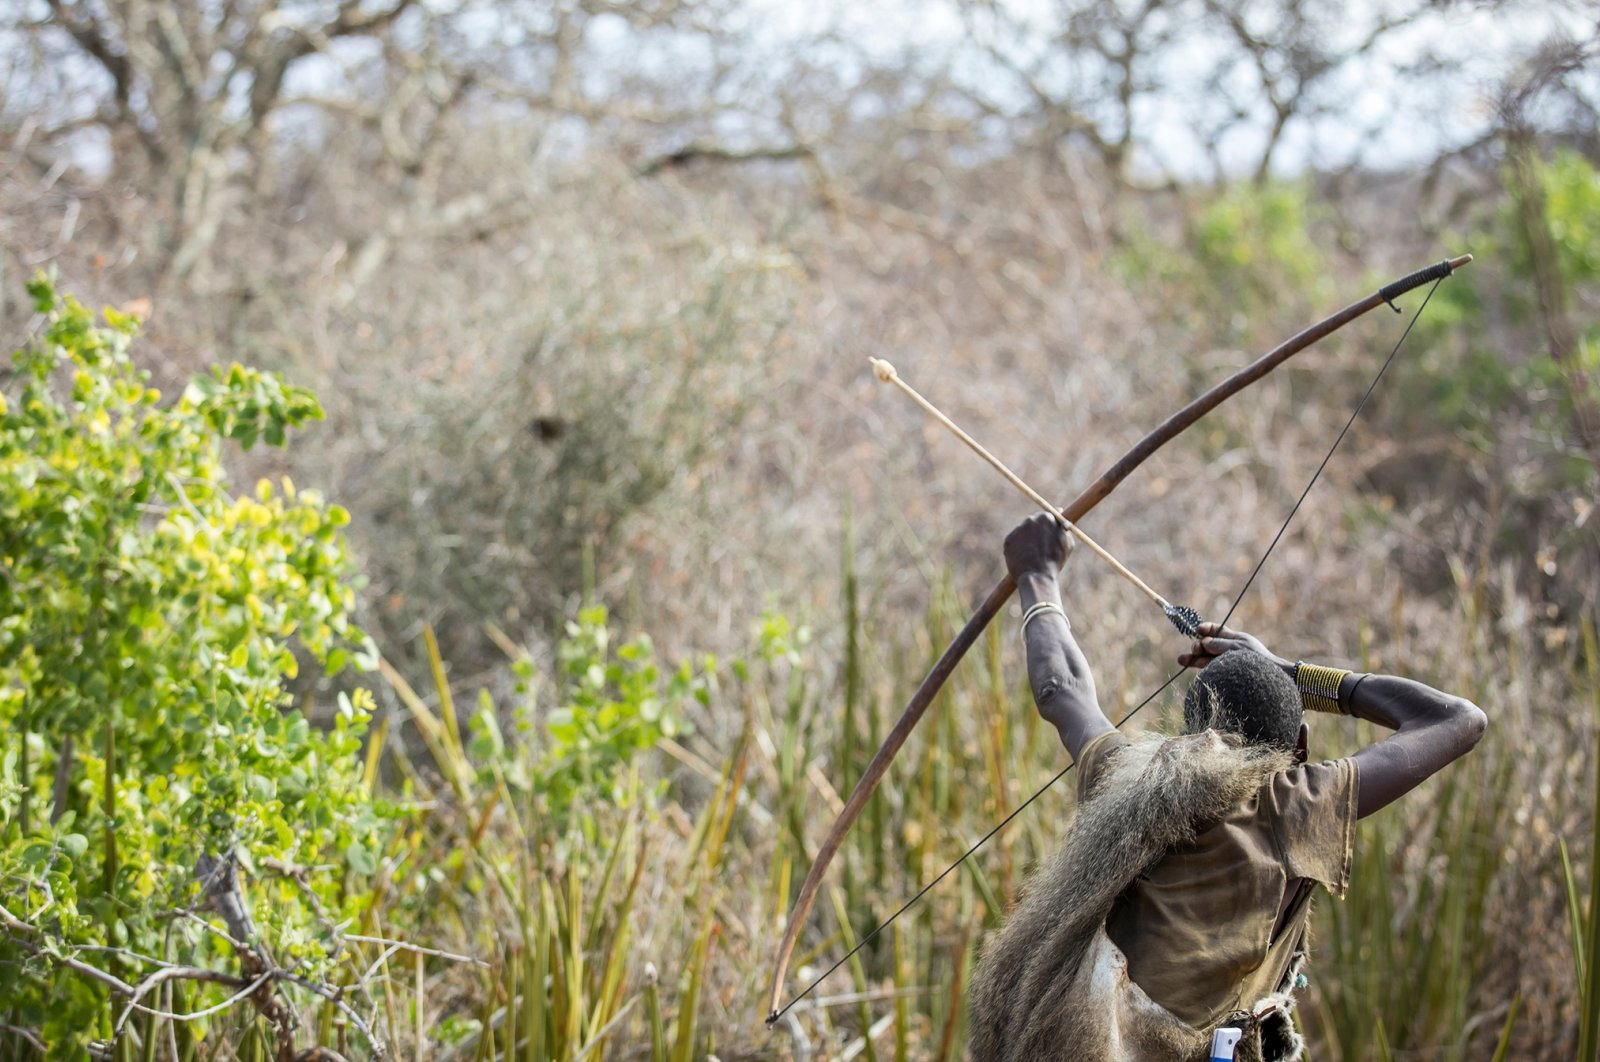 A Hadza hunter draws his bow as he prepares to shoot an arrowin northern Tanzania. (Shutterstock Photo)